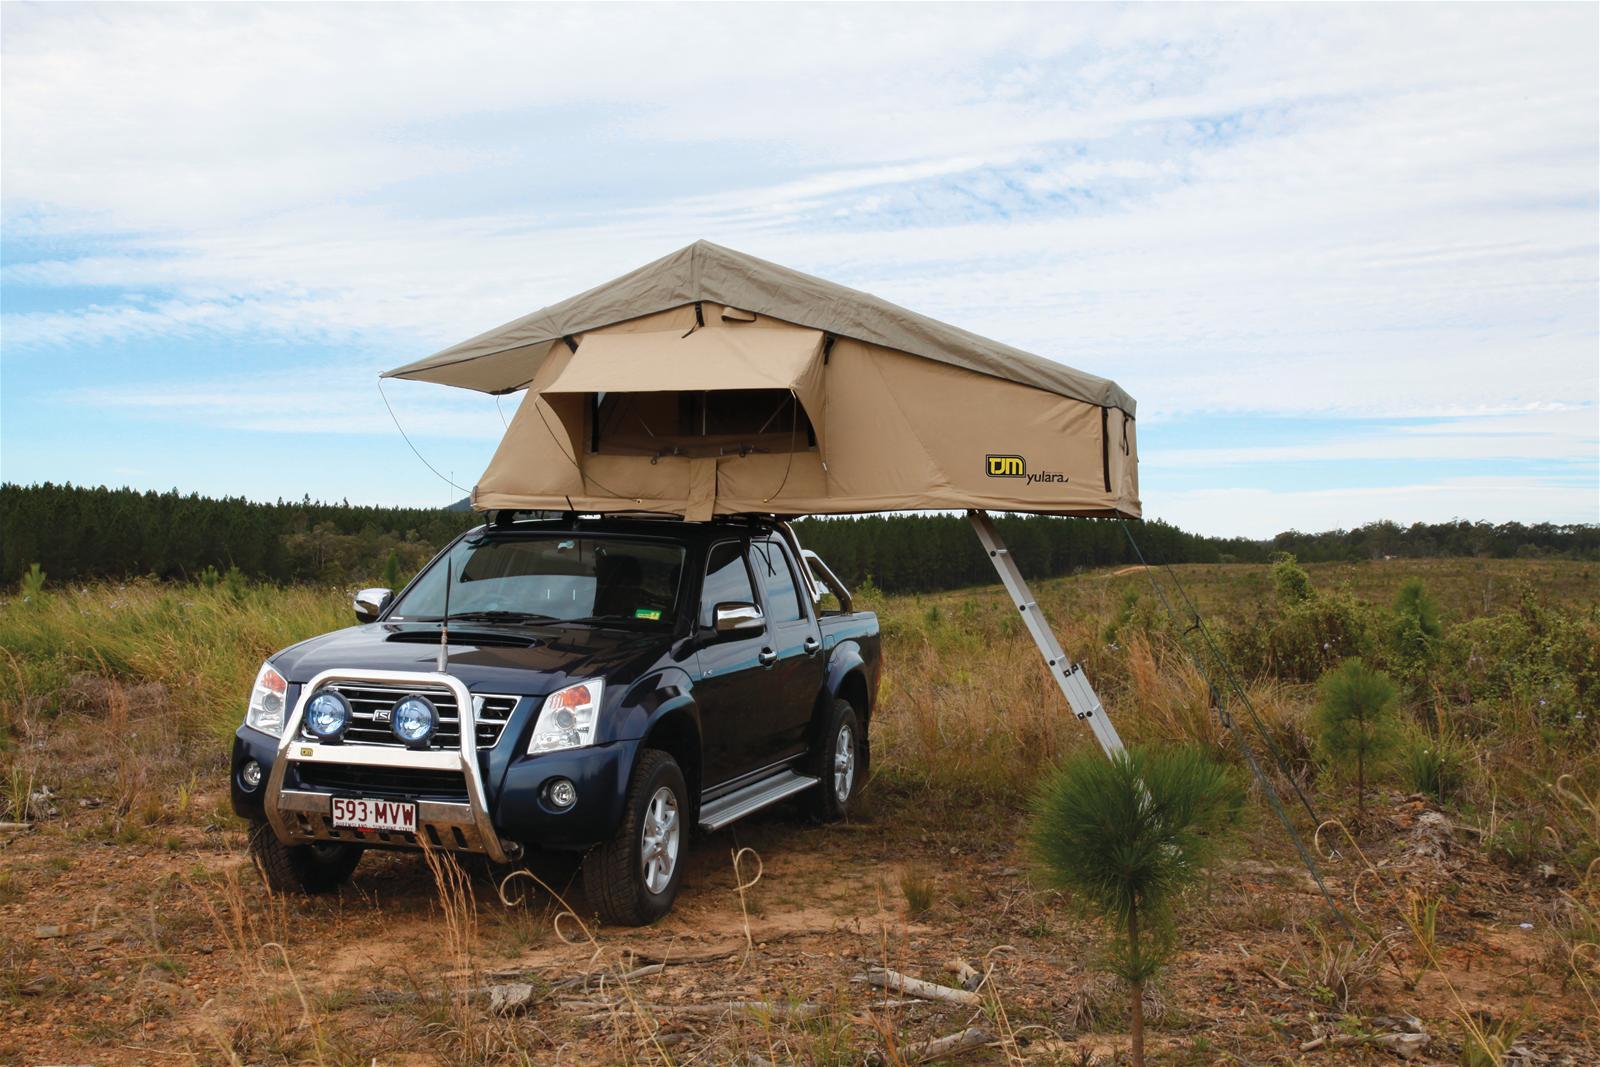 Tjm Equipped Yulara Roof Top Tent 10 1 2 X 4 1 2 X 4 1 4